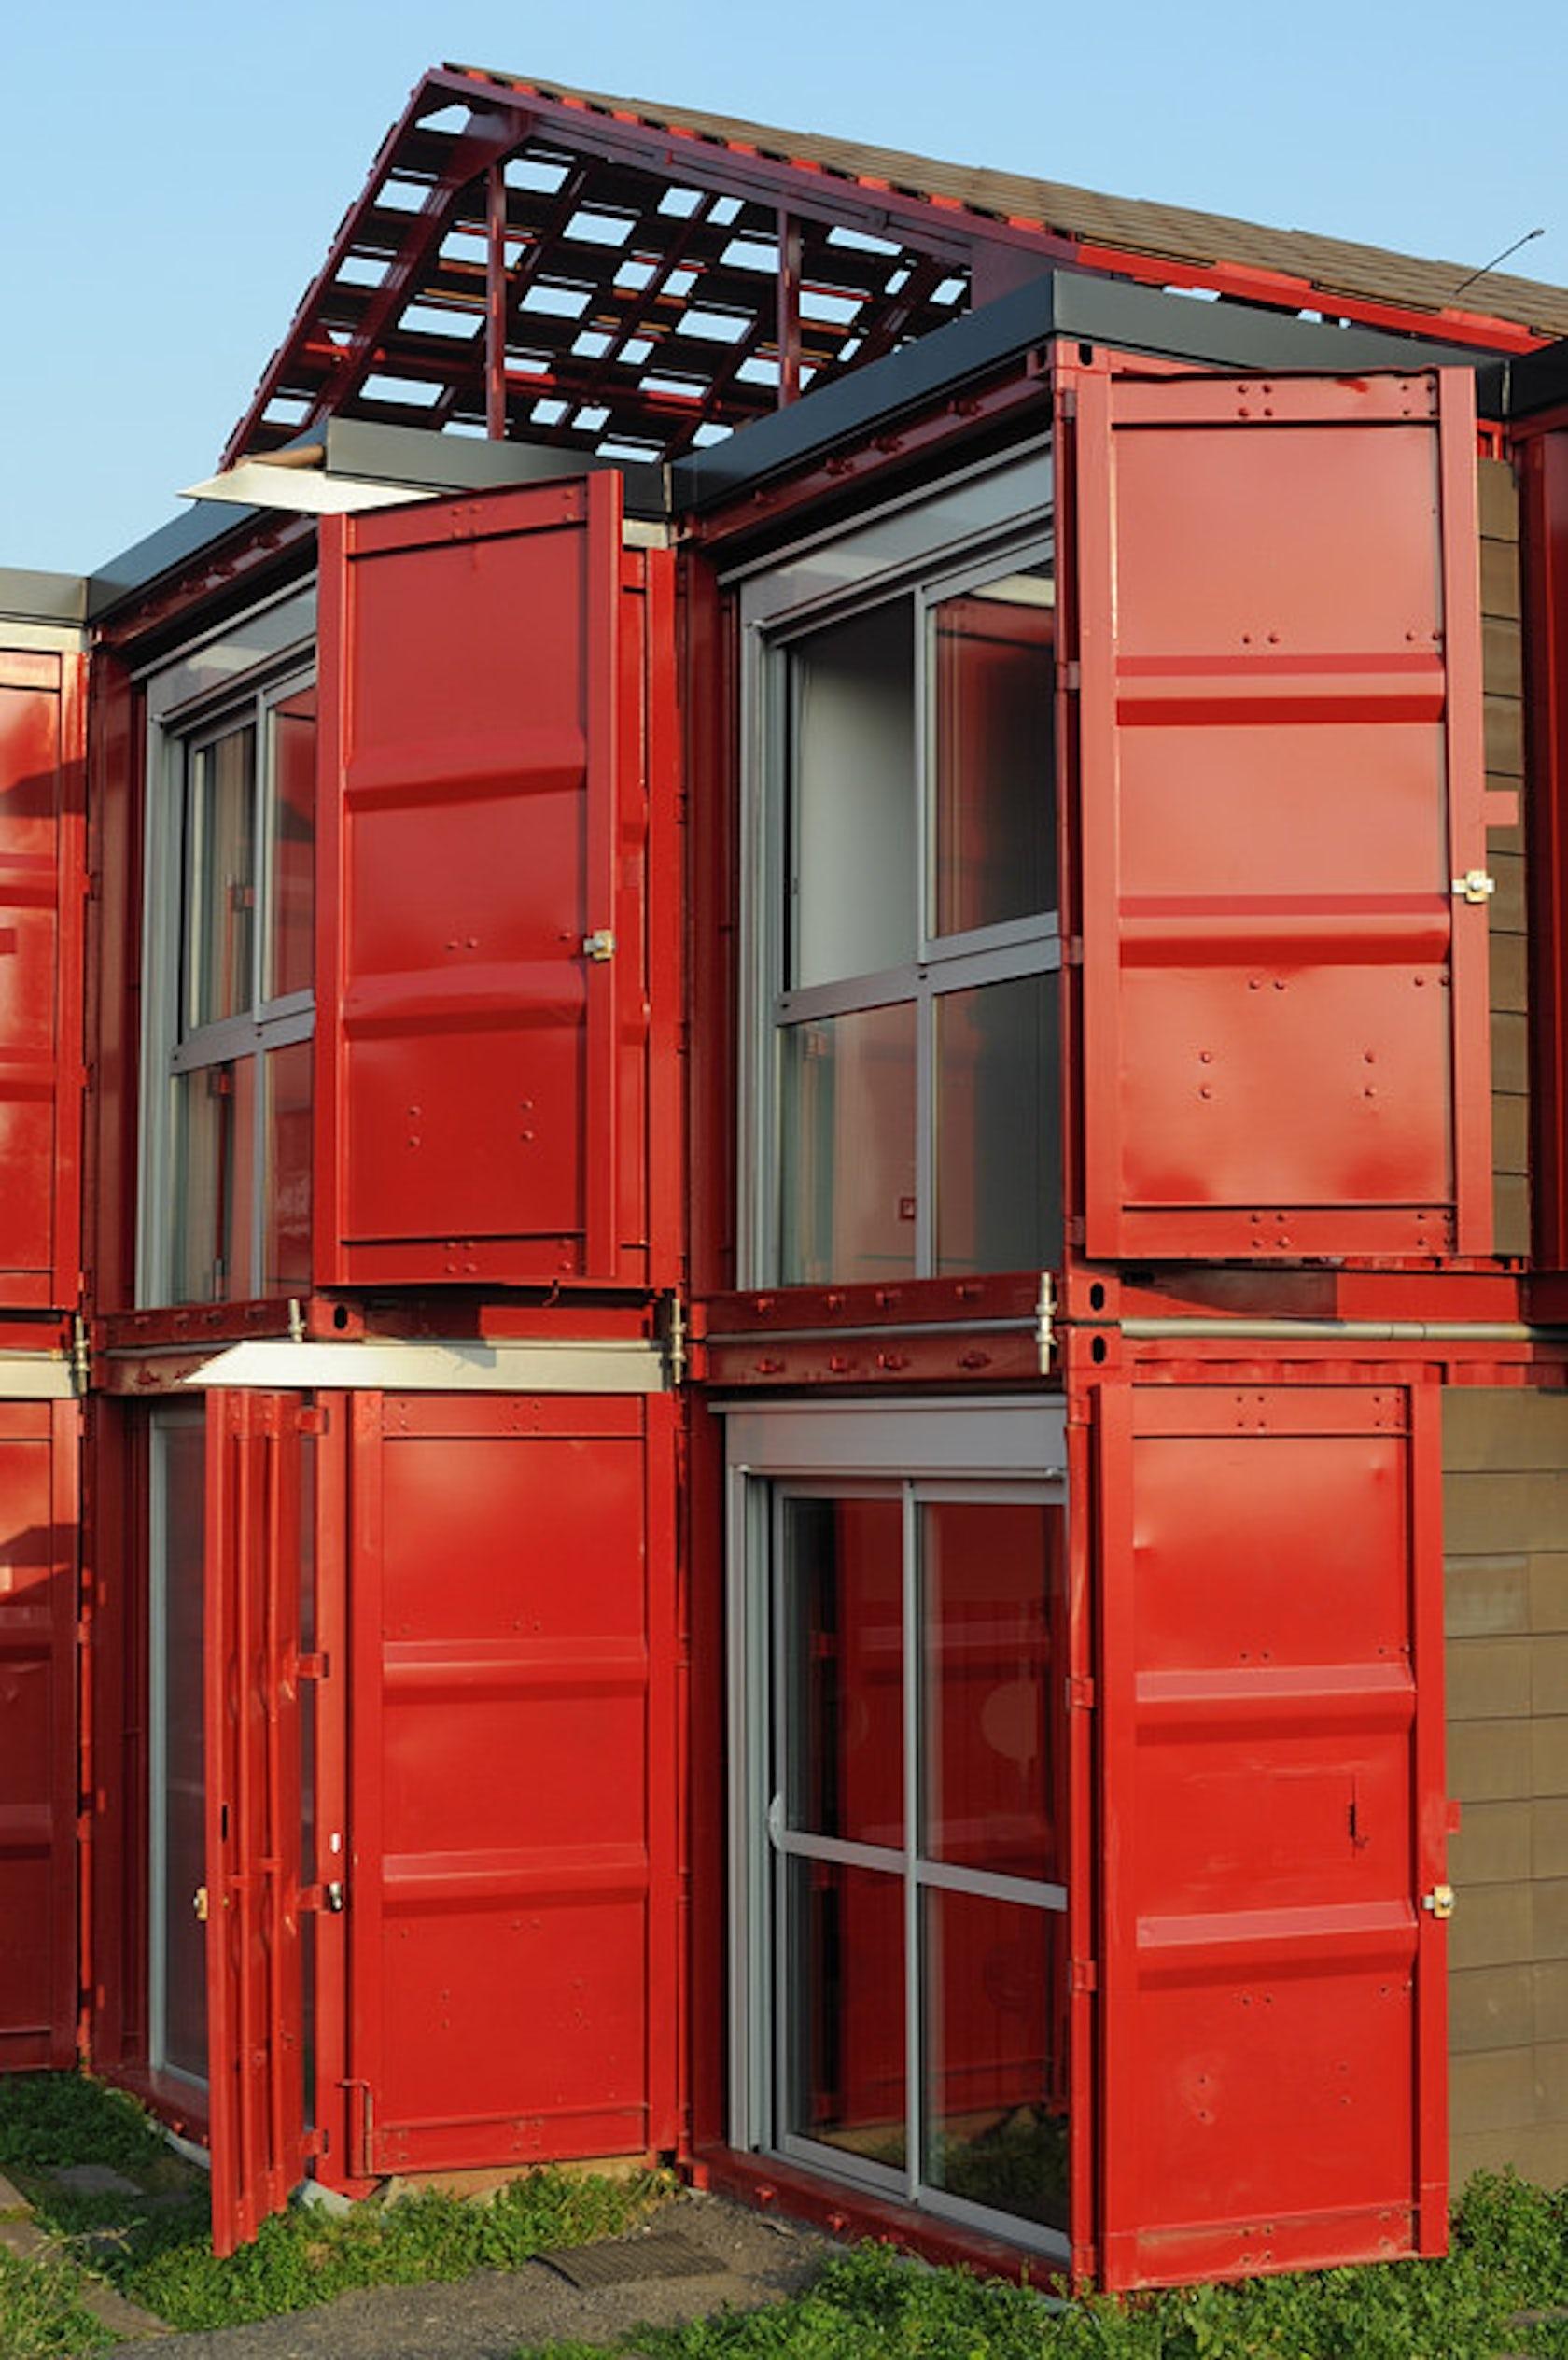 maison container lille architizer. Black Bedroom Furniture Sets. Home Design Ideas